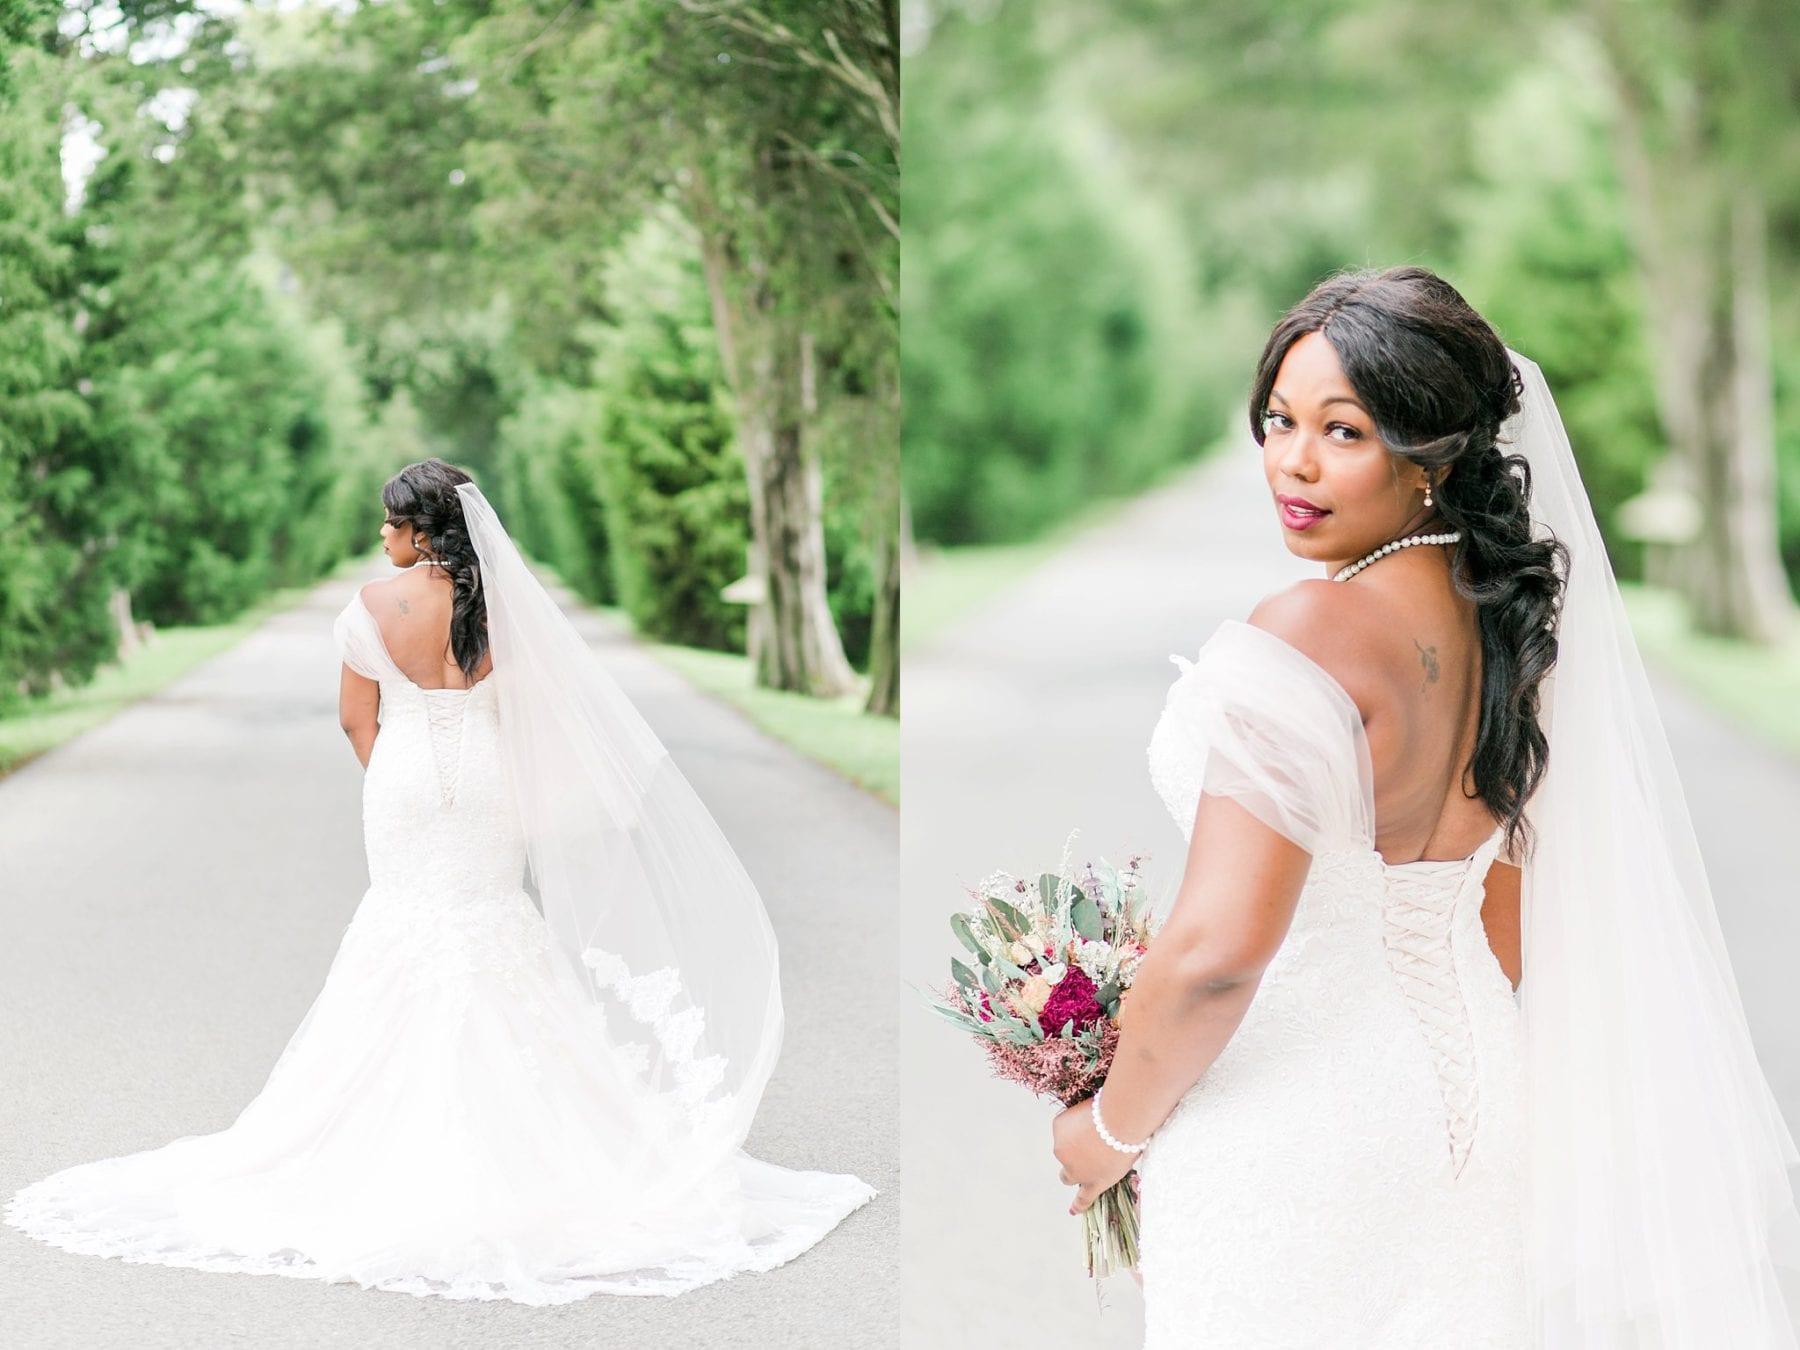 Jefferson Patterson Park Wedding Maryland Wedding Photographer Megan Kelsey Photography Jasmine & Seyi-59.jpg